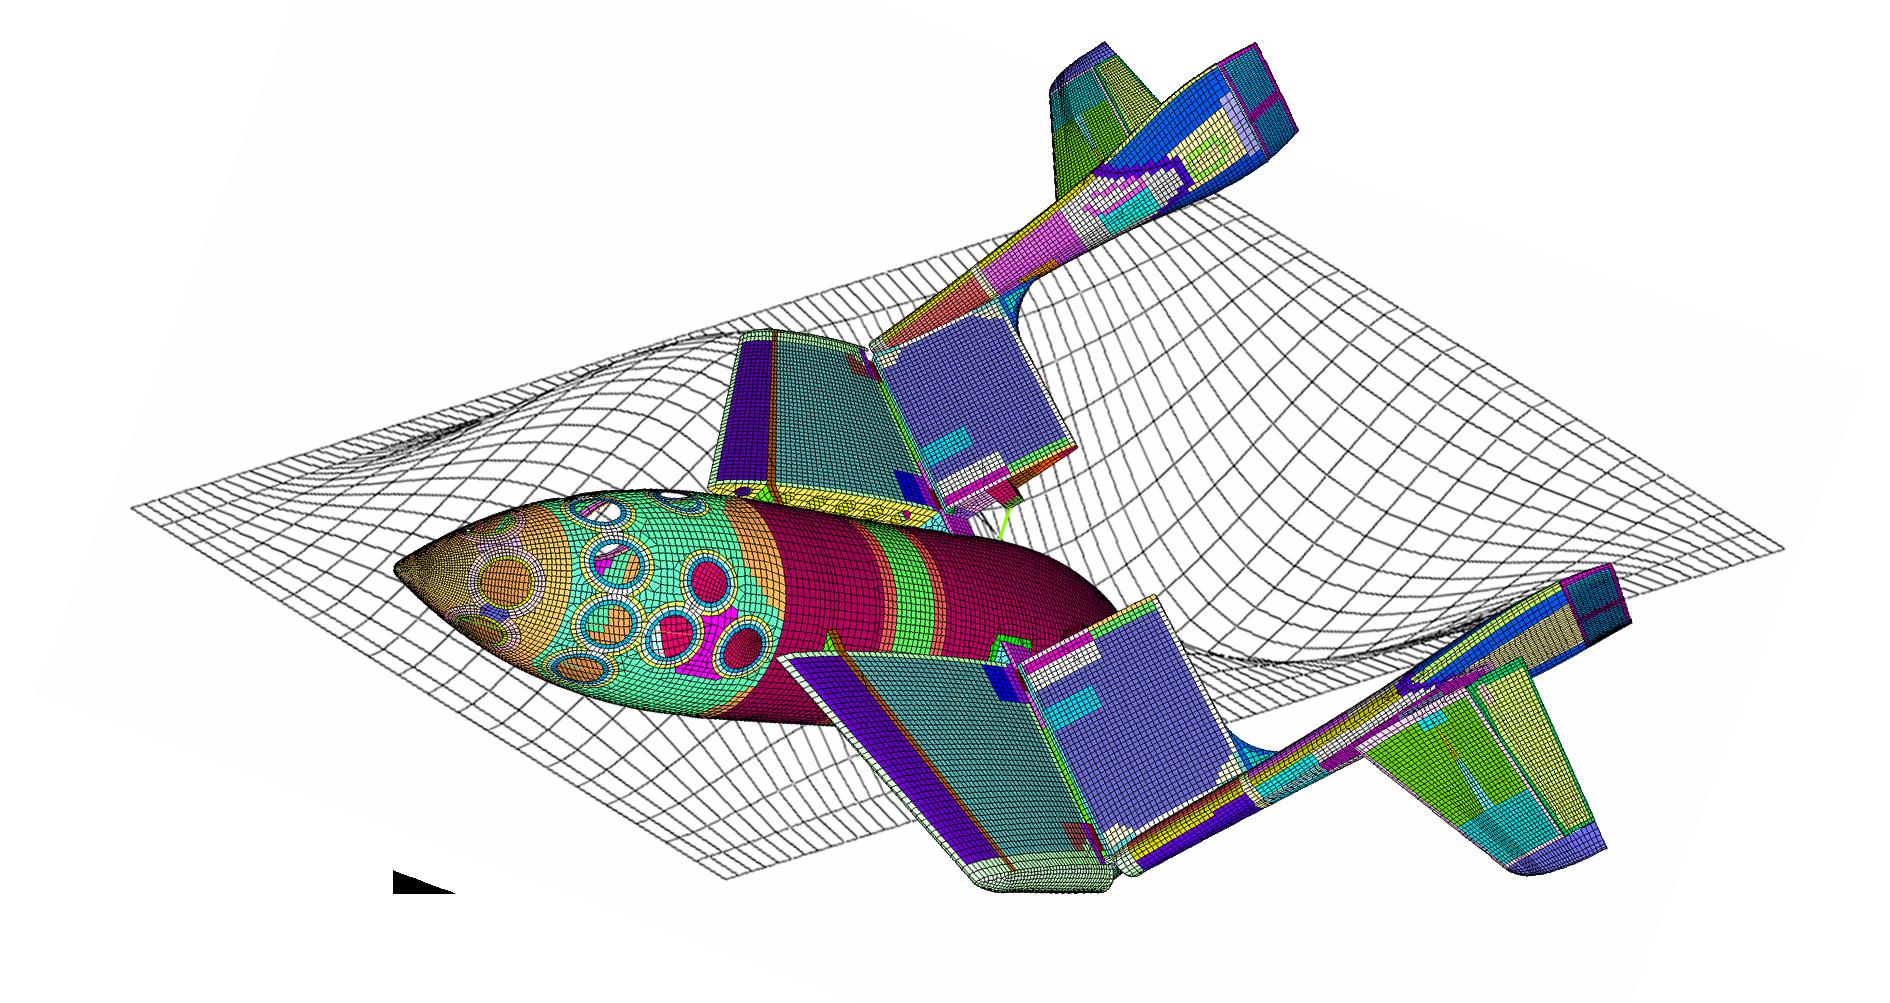 Комплект Advanced Bundle (E520/521) в Siemens Femap